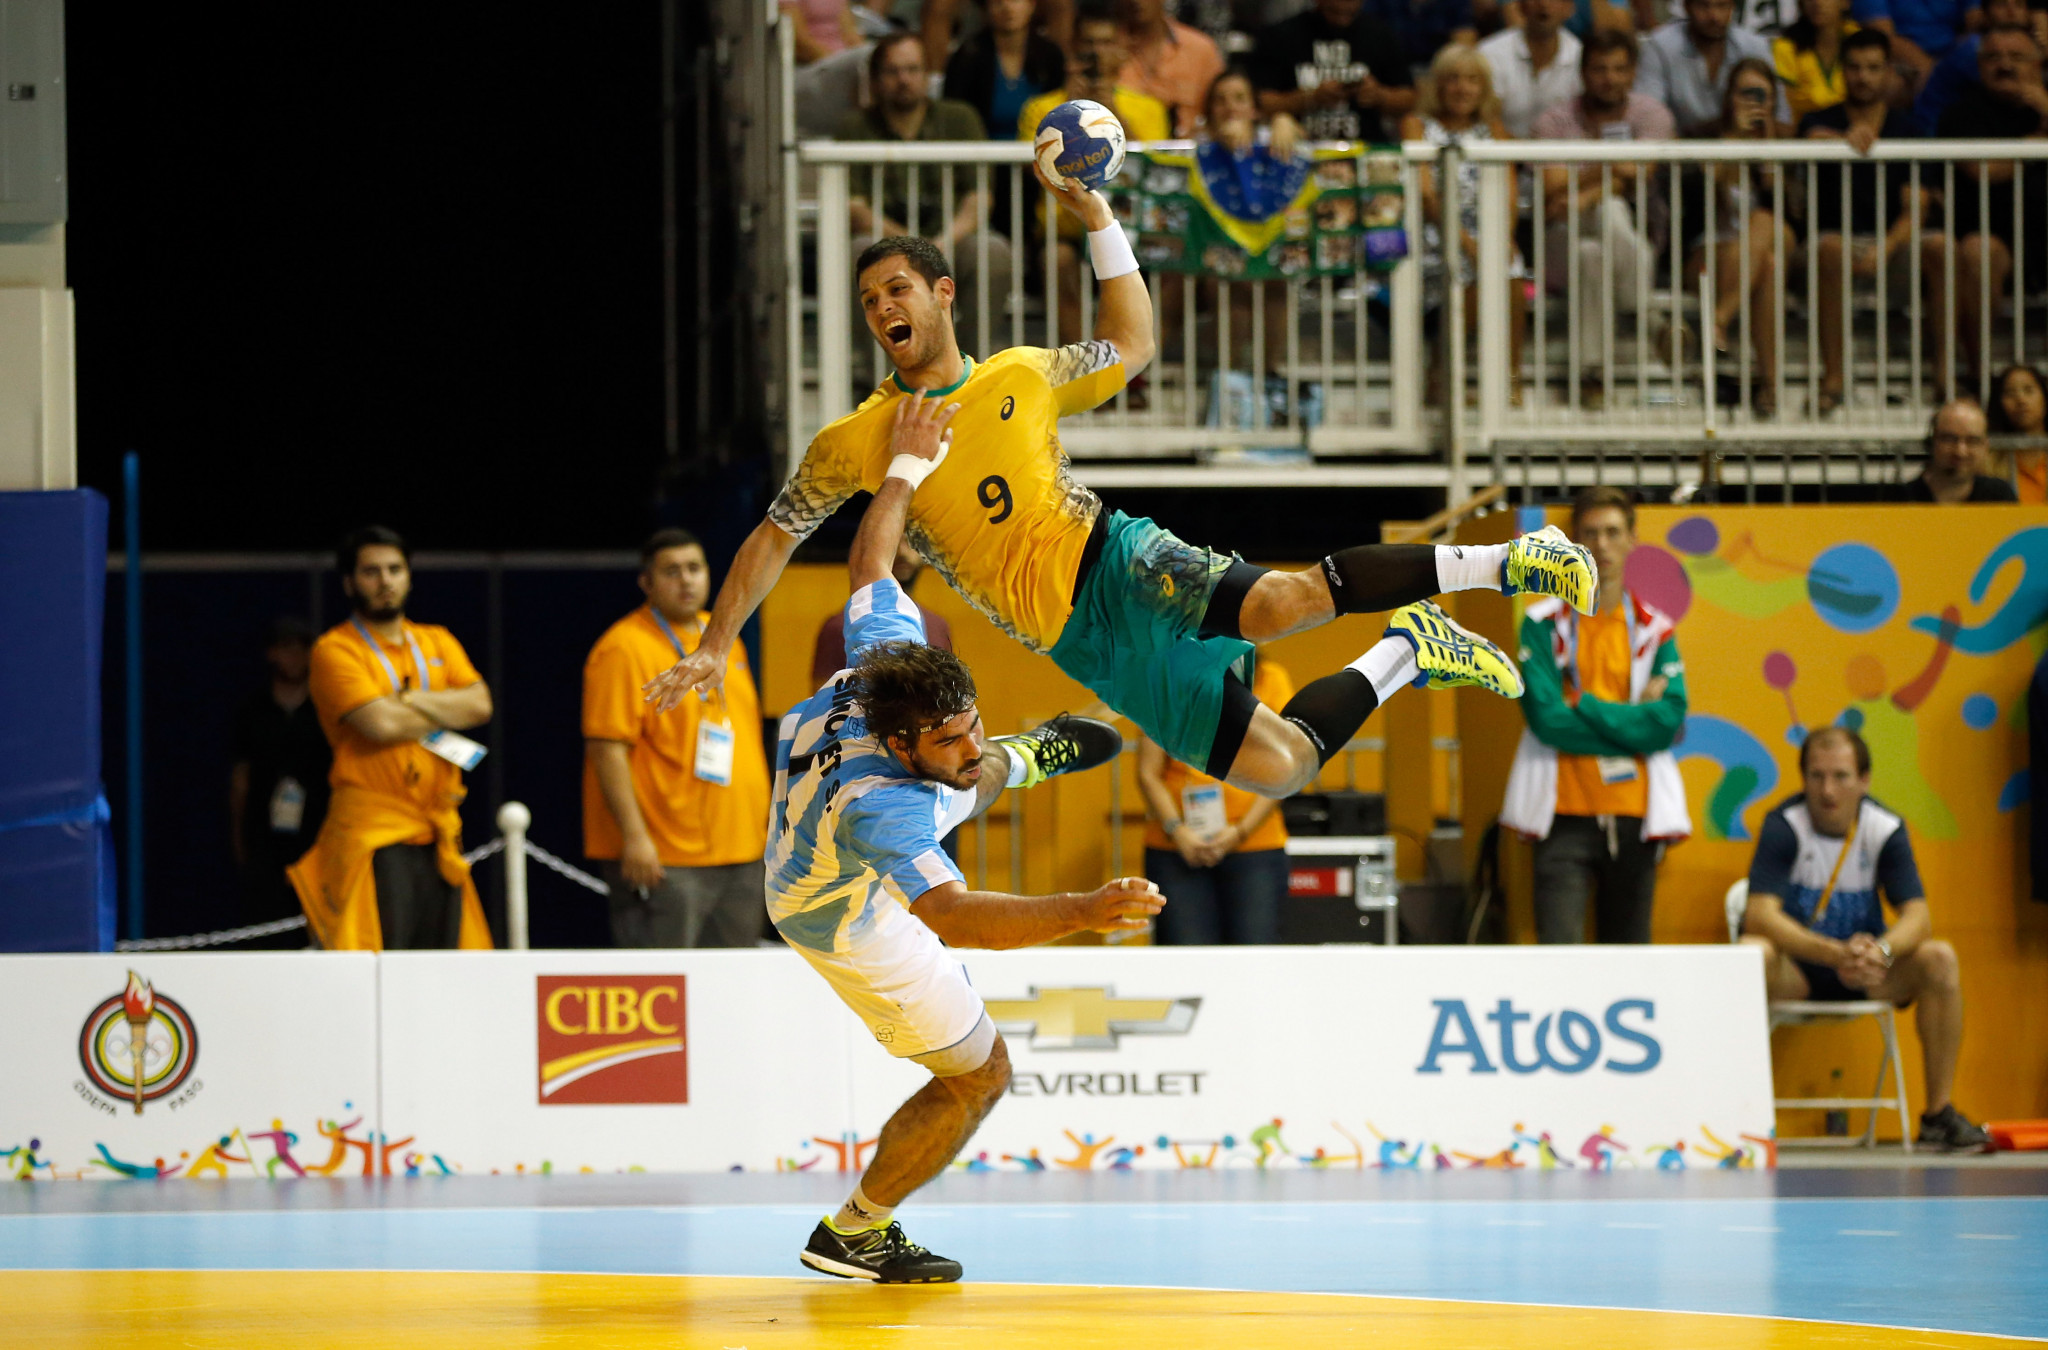 Defending champions Brazil make winning start at Pan American Men's Handball Championship